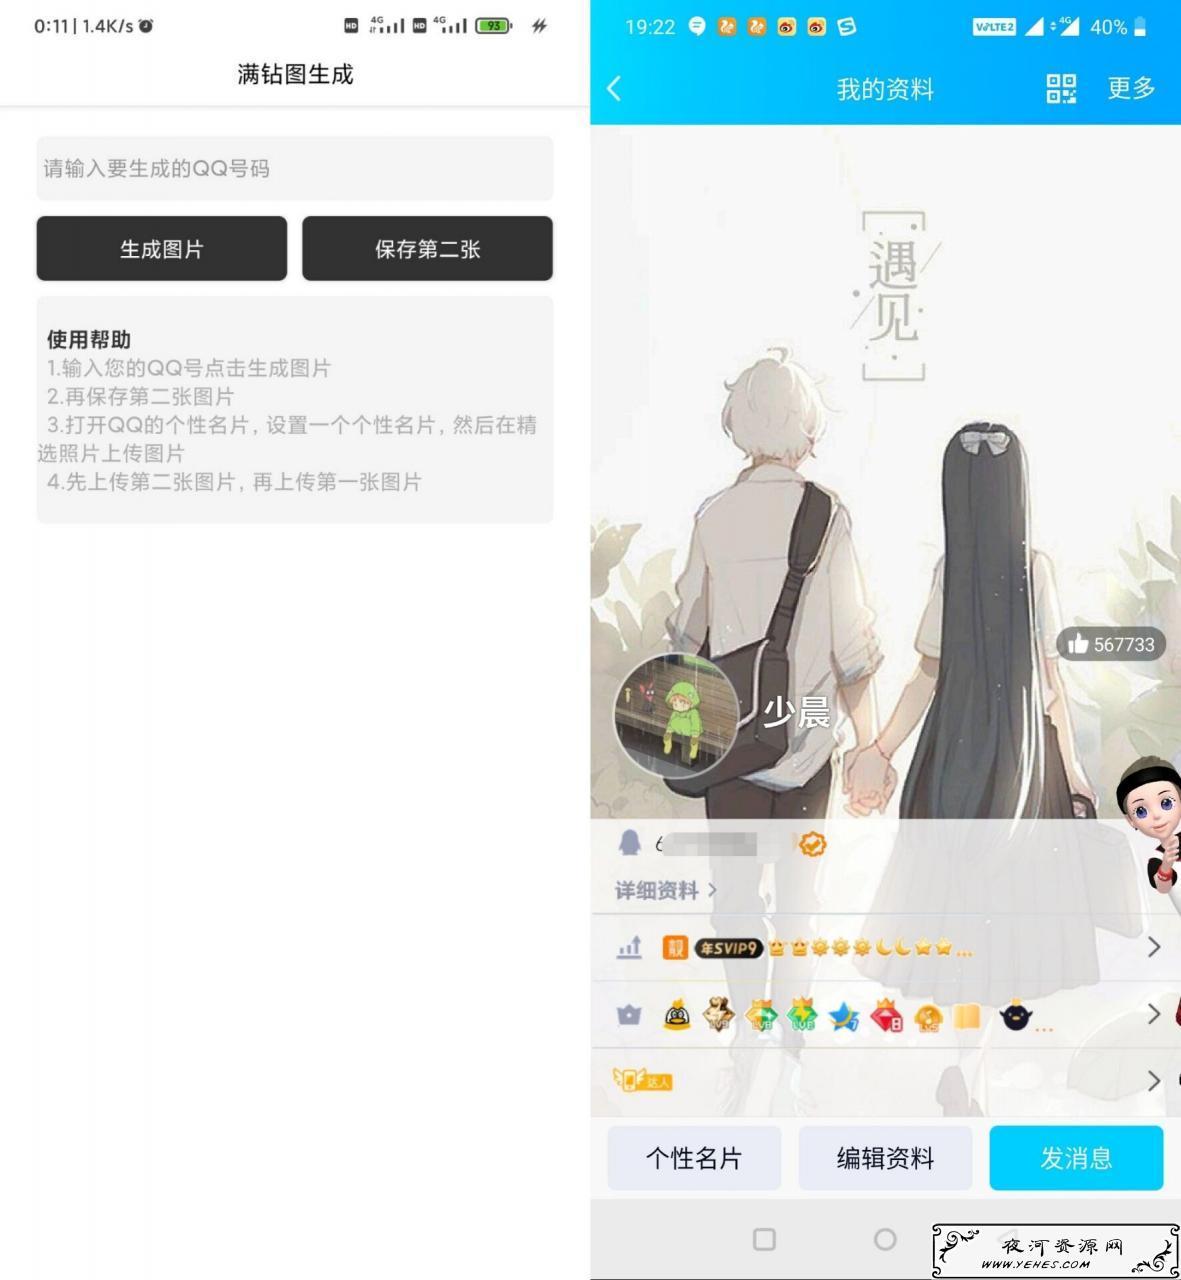 安卓QQ满超会5钻图生成器 Android安卓 第1张